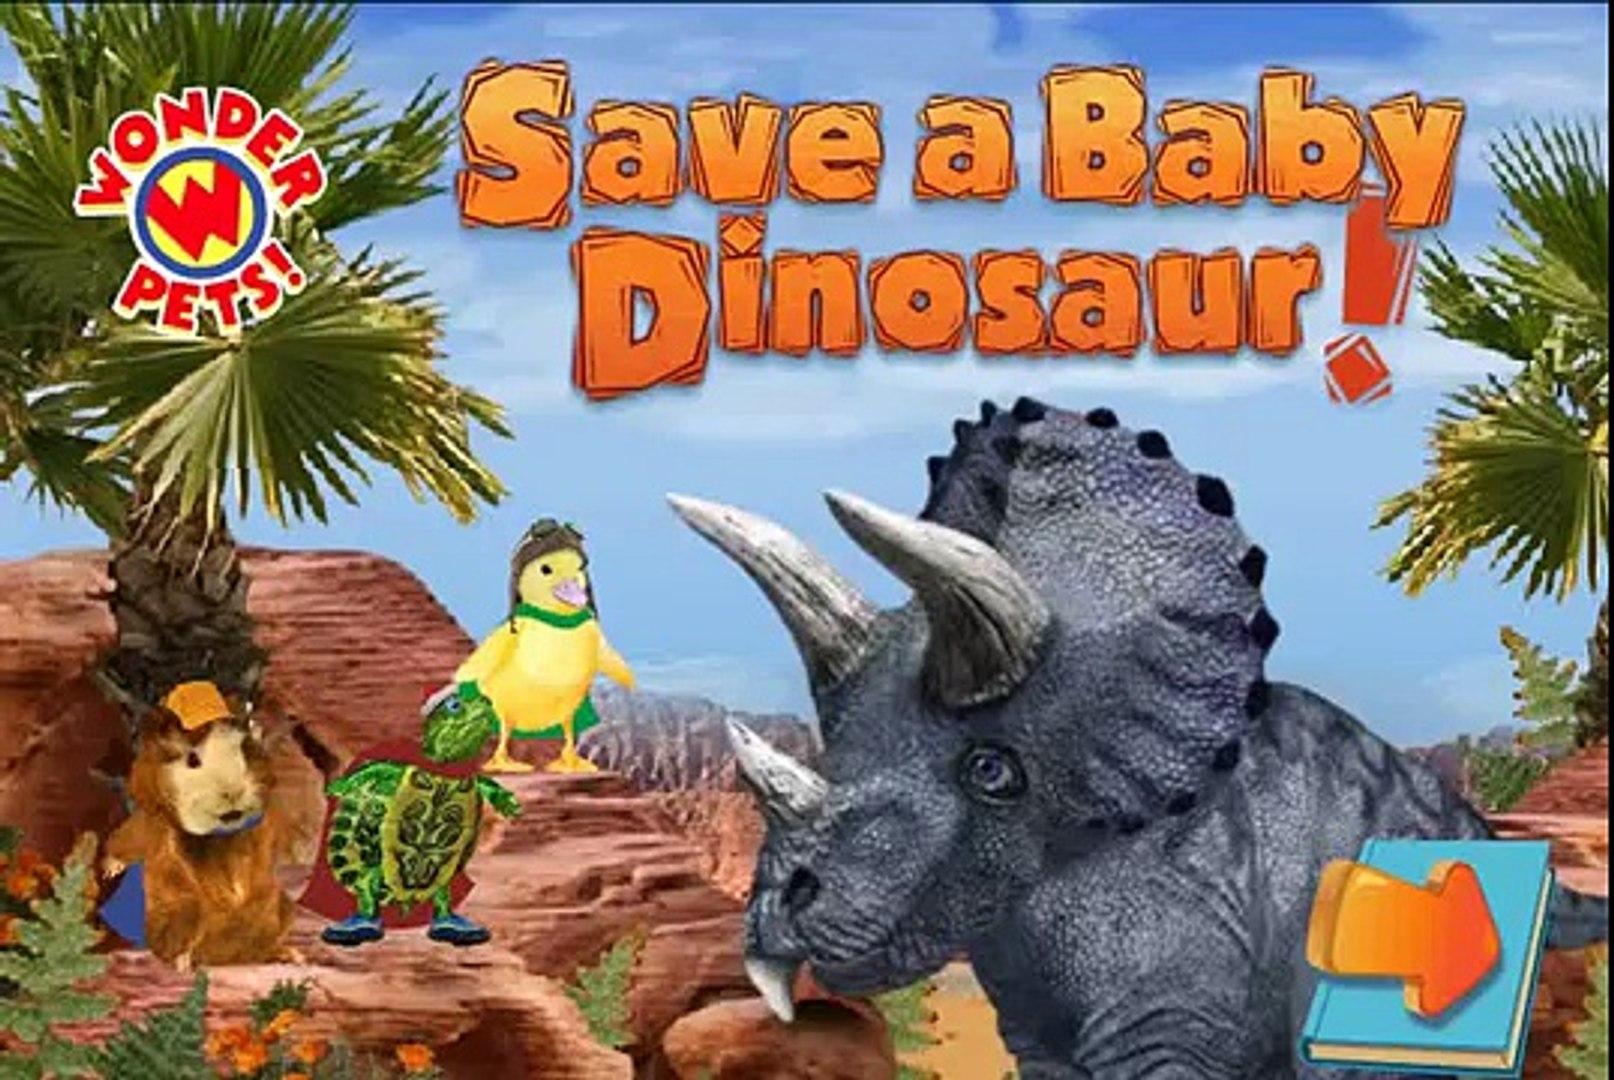 Wonder Pets Save a Baby DinosaurЧудо зверята спасают динозавра